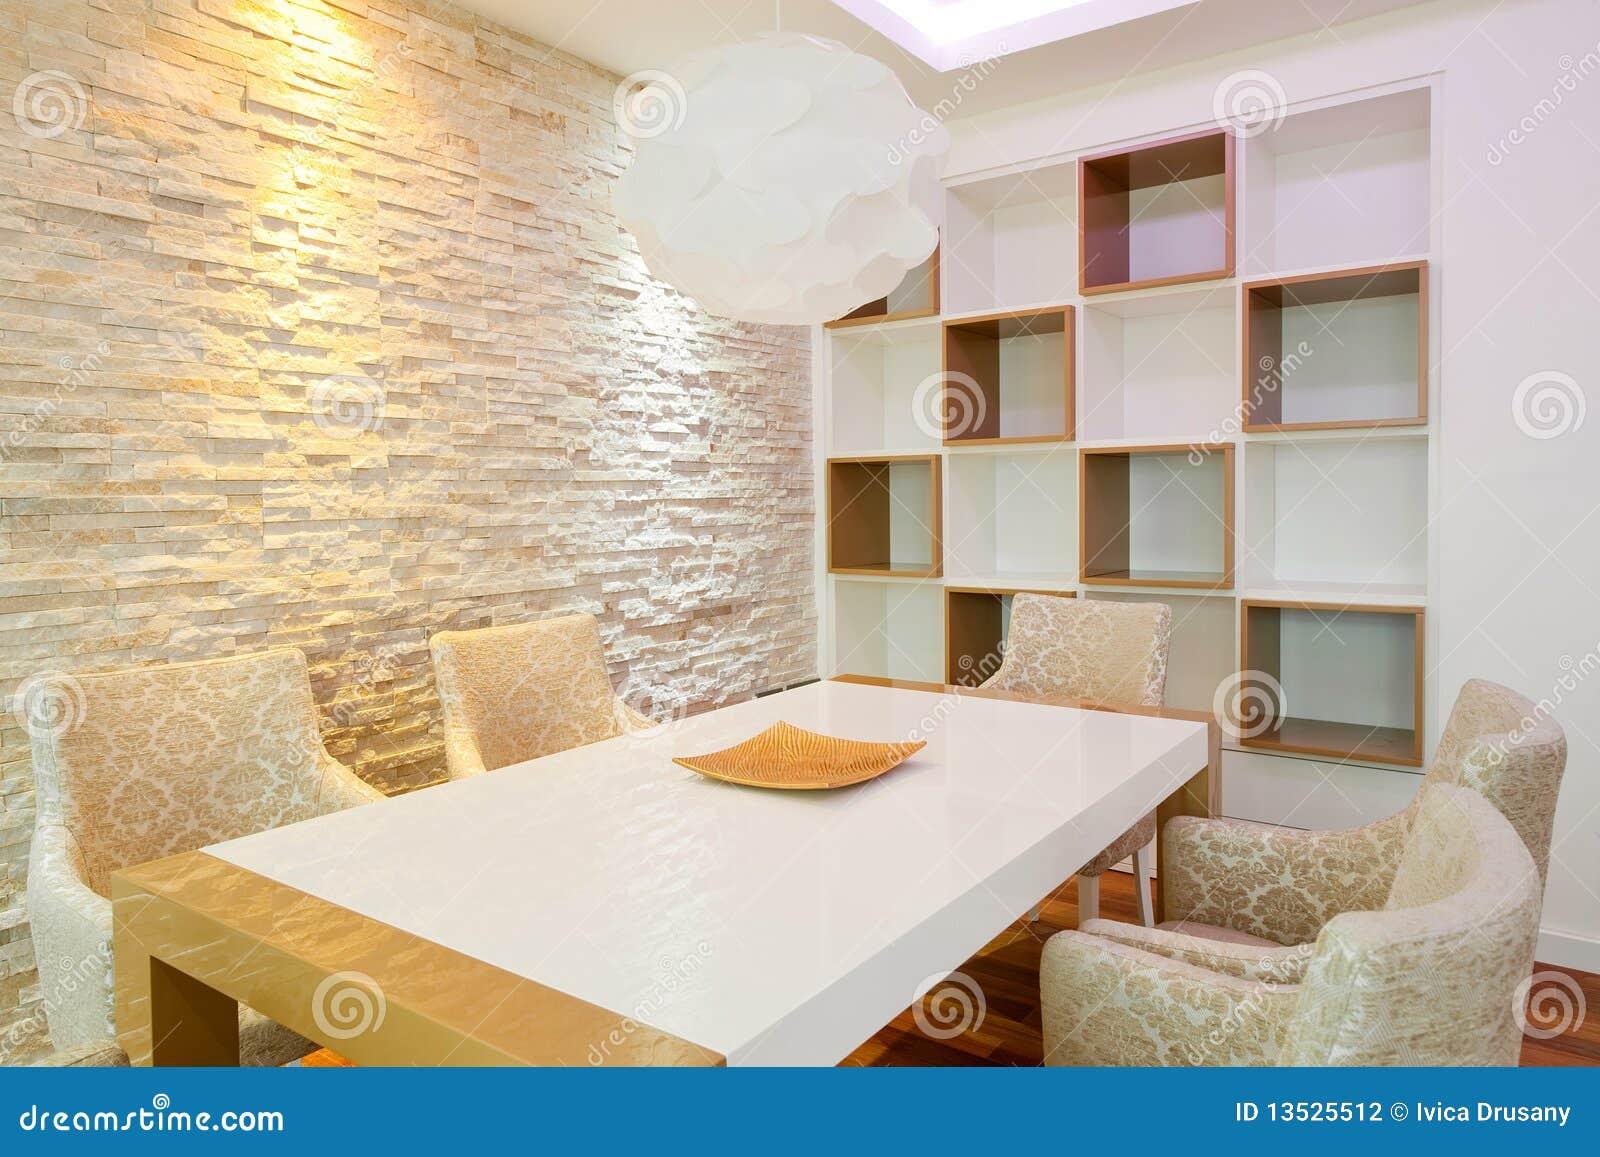 Arredamento sala da pranzo moderna: arredamento moderno sala da ...